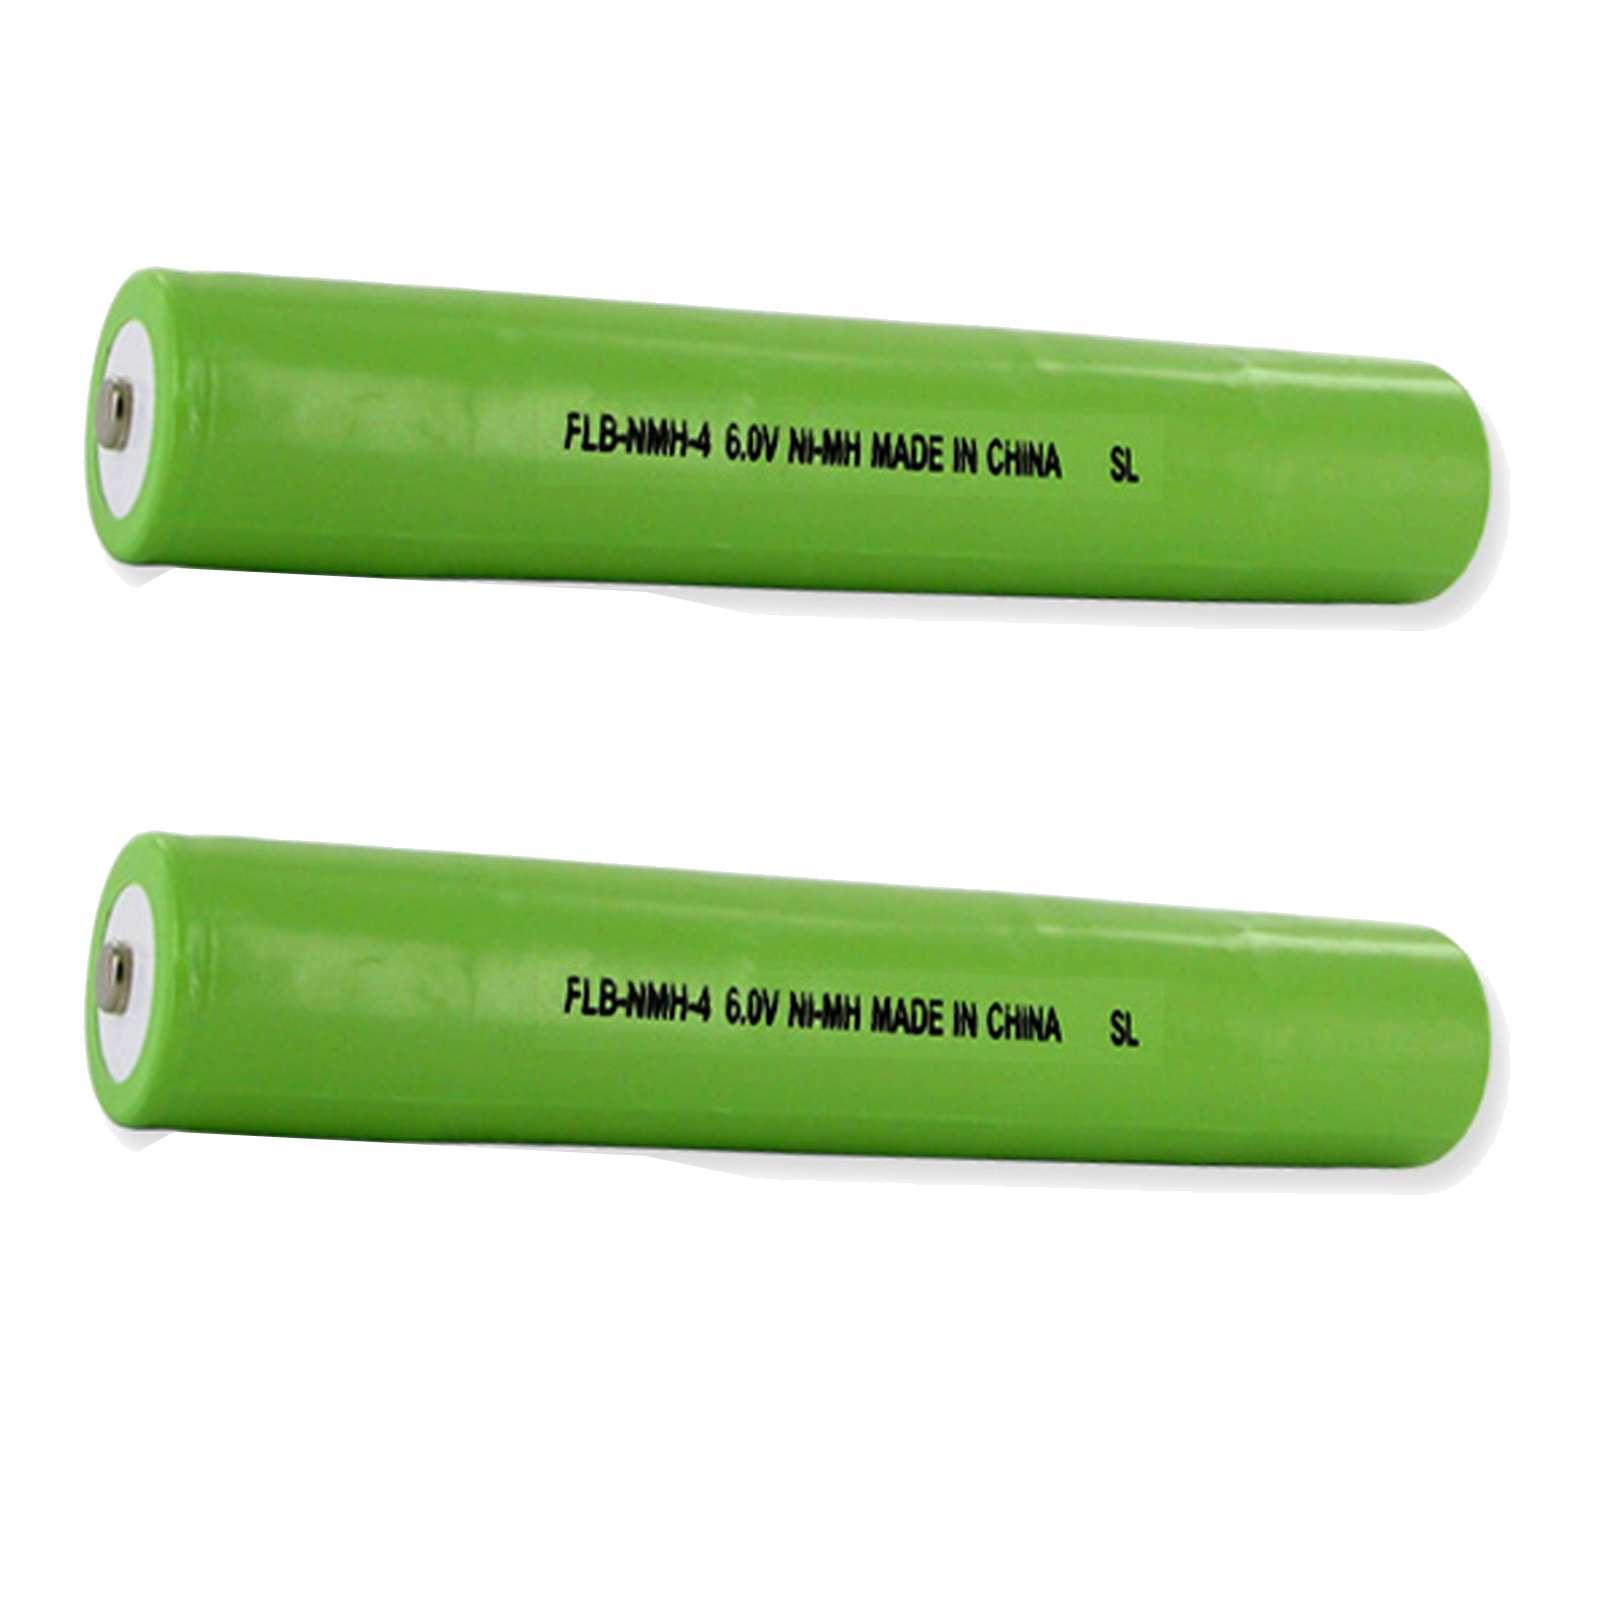 2pc Exell Flashlight Battery 6V 1600mAh NICD Replaces Streamlight 25170